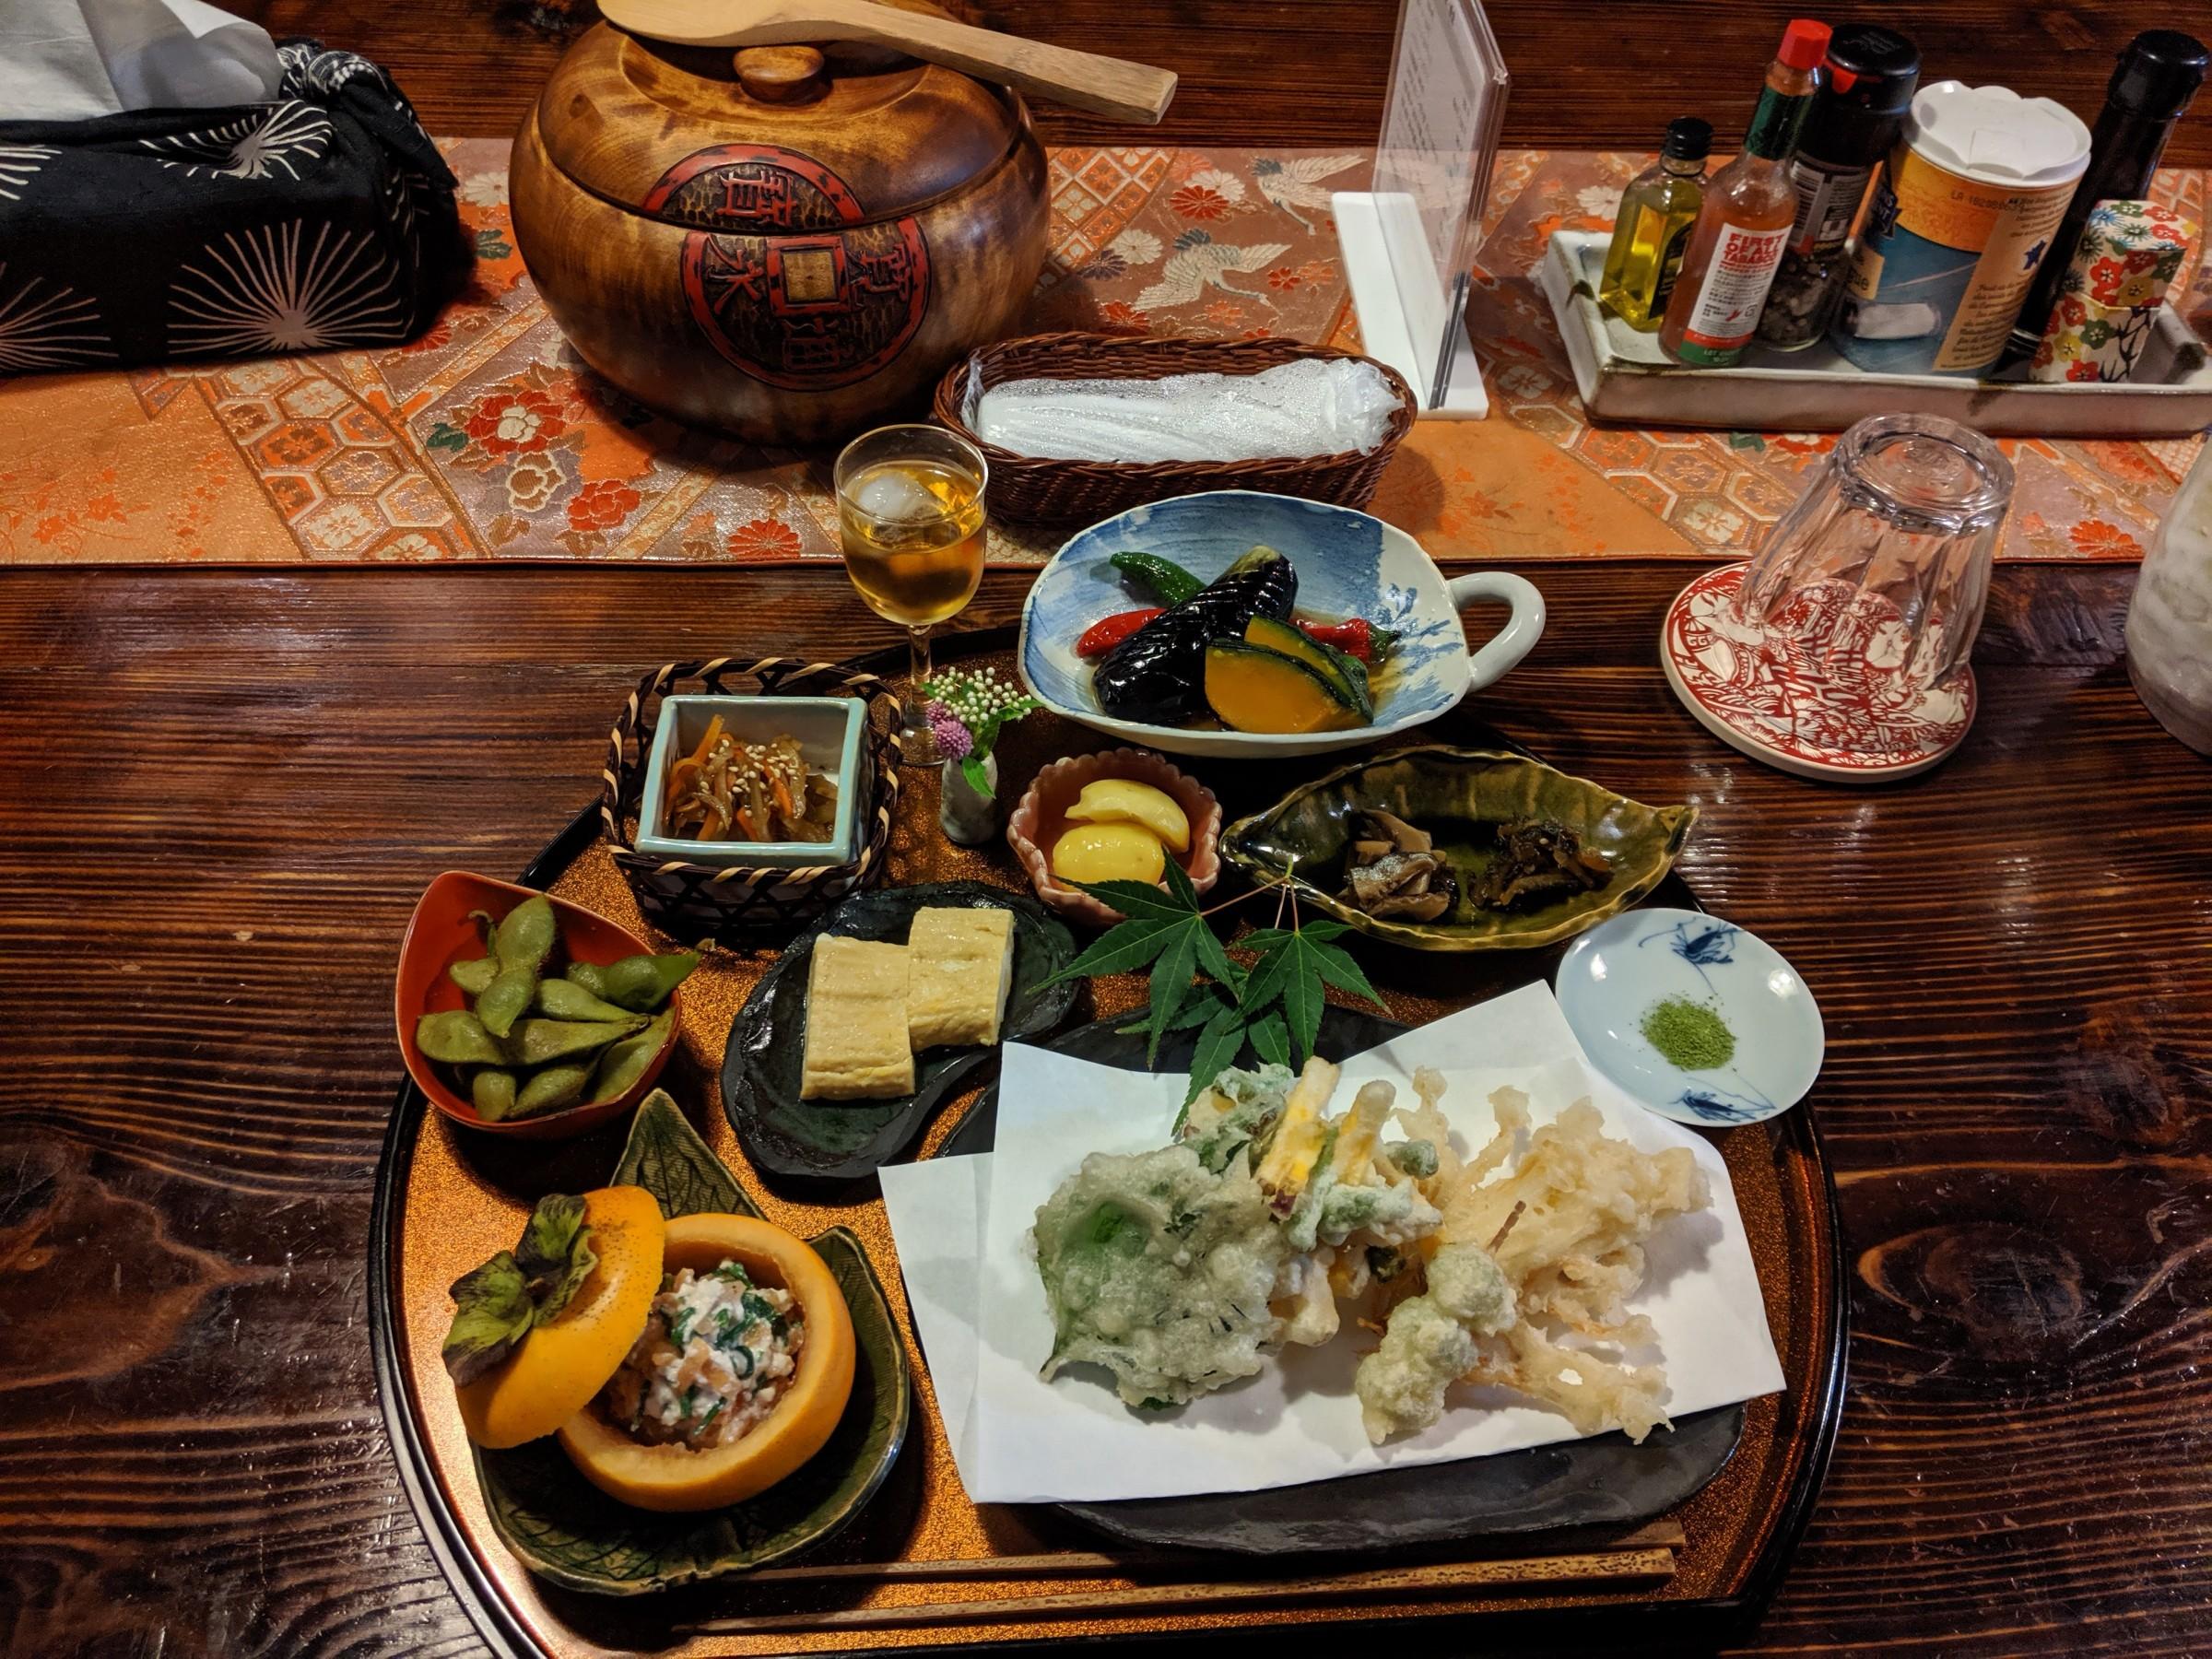 Delicious Japanese food at the Furumaya House ryokan